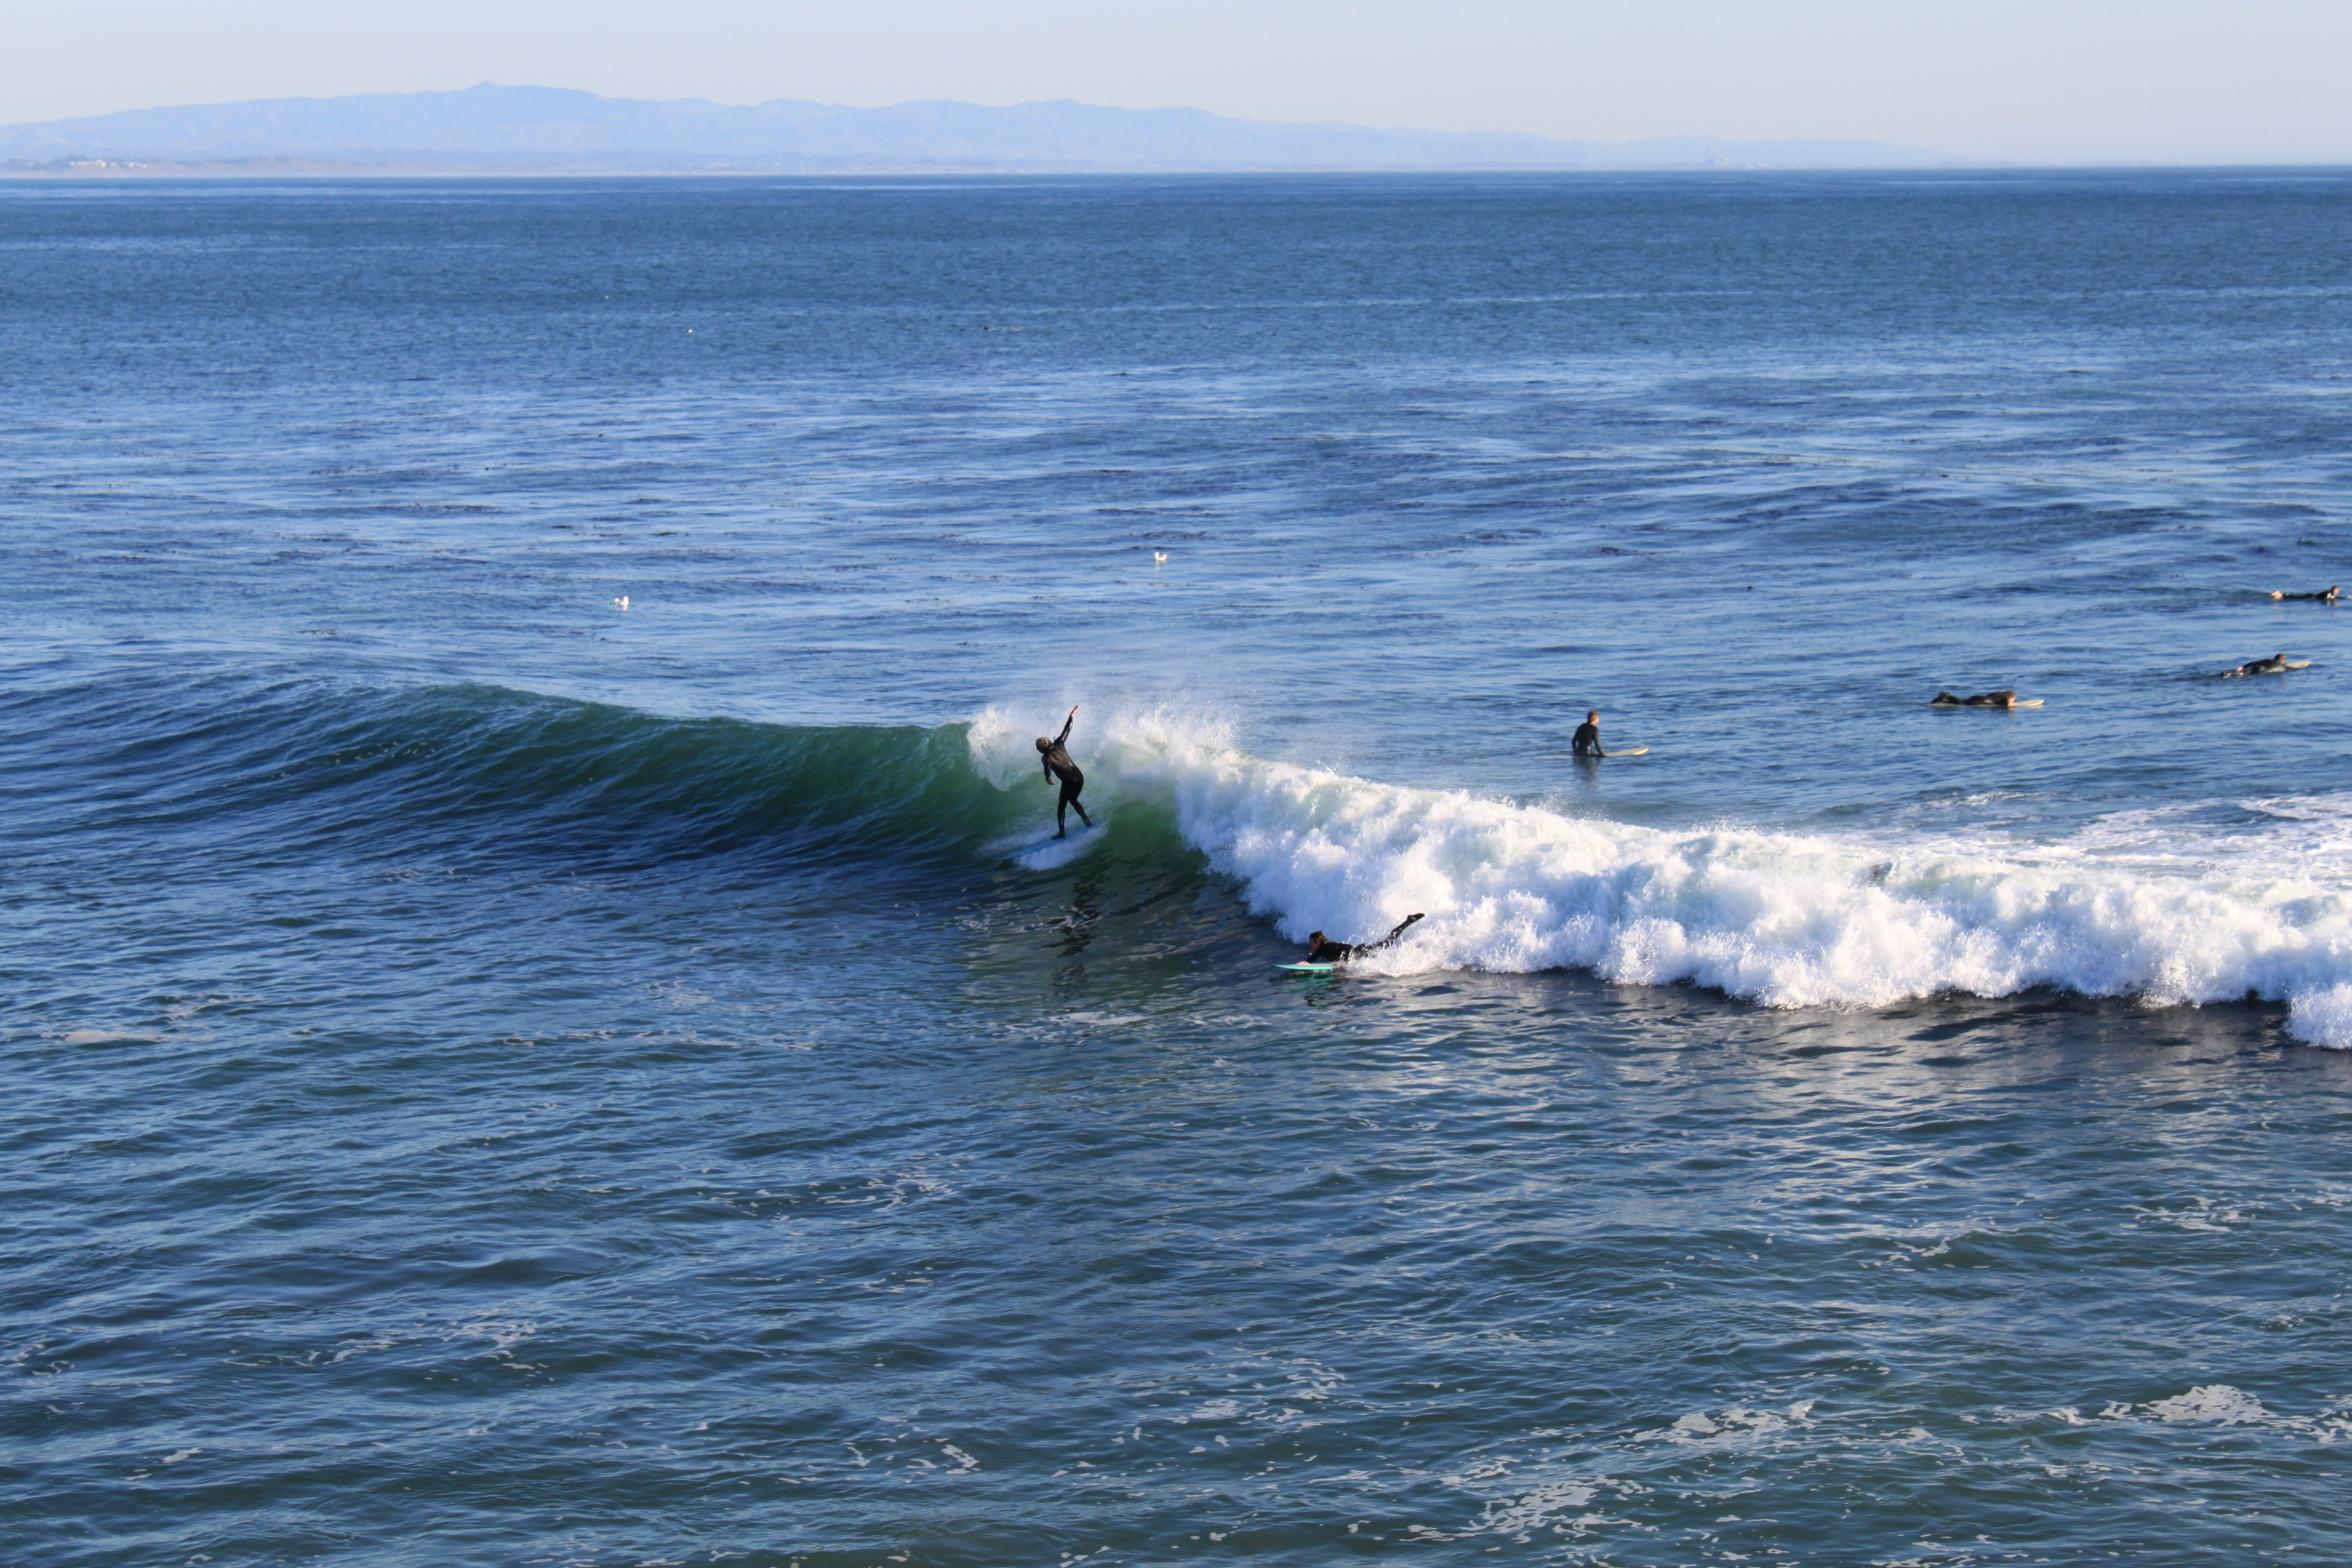 Surfers at Santa Cruz, California